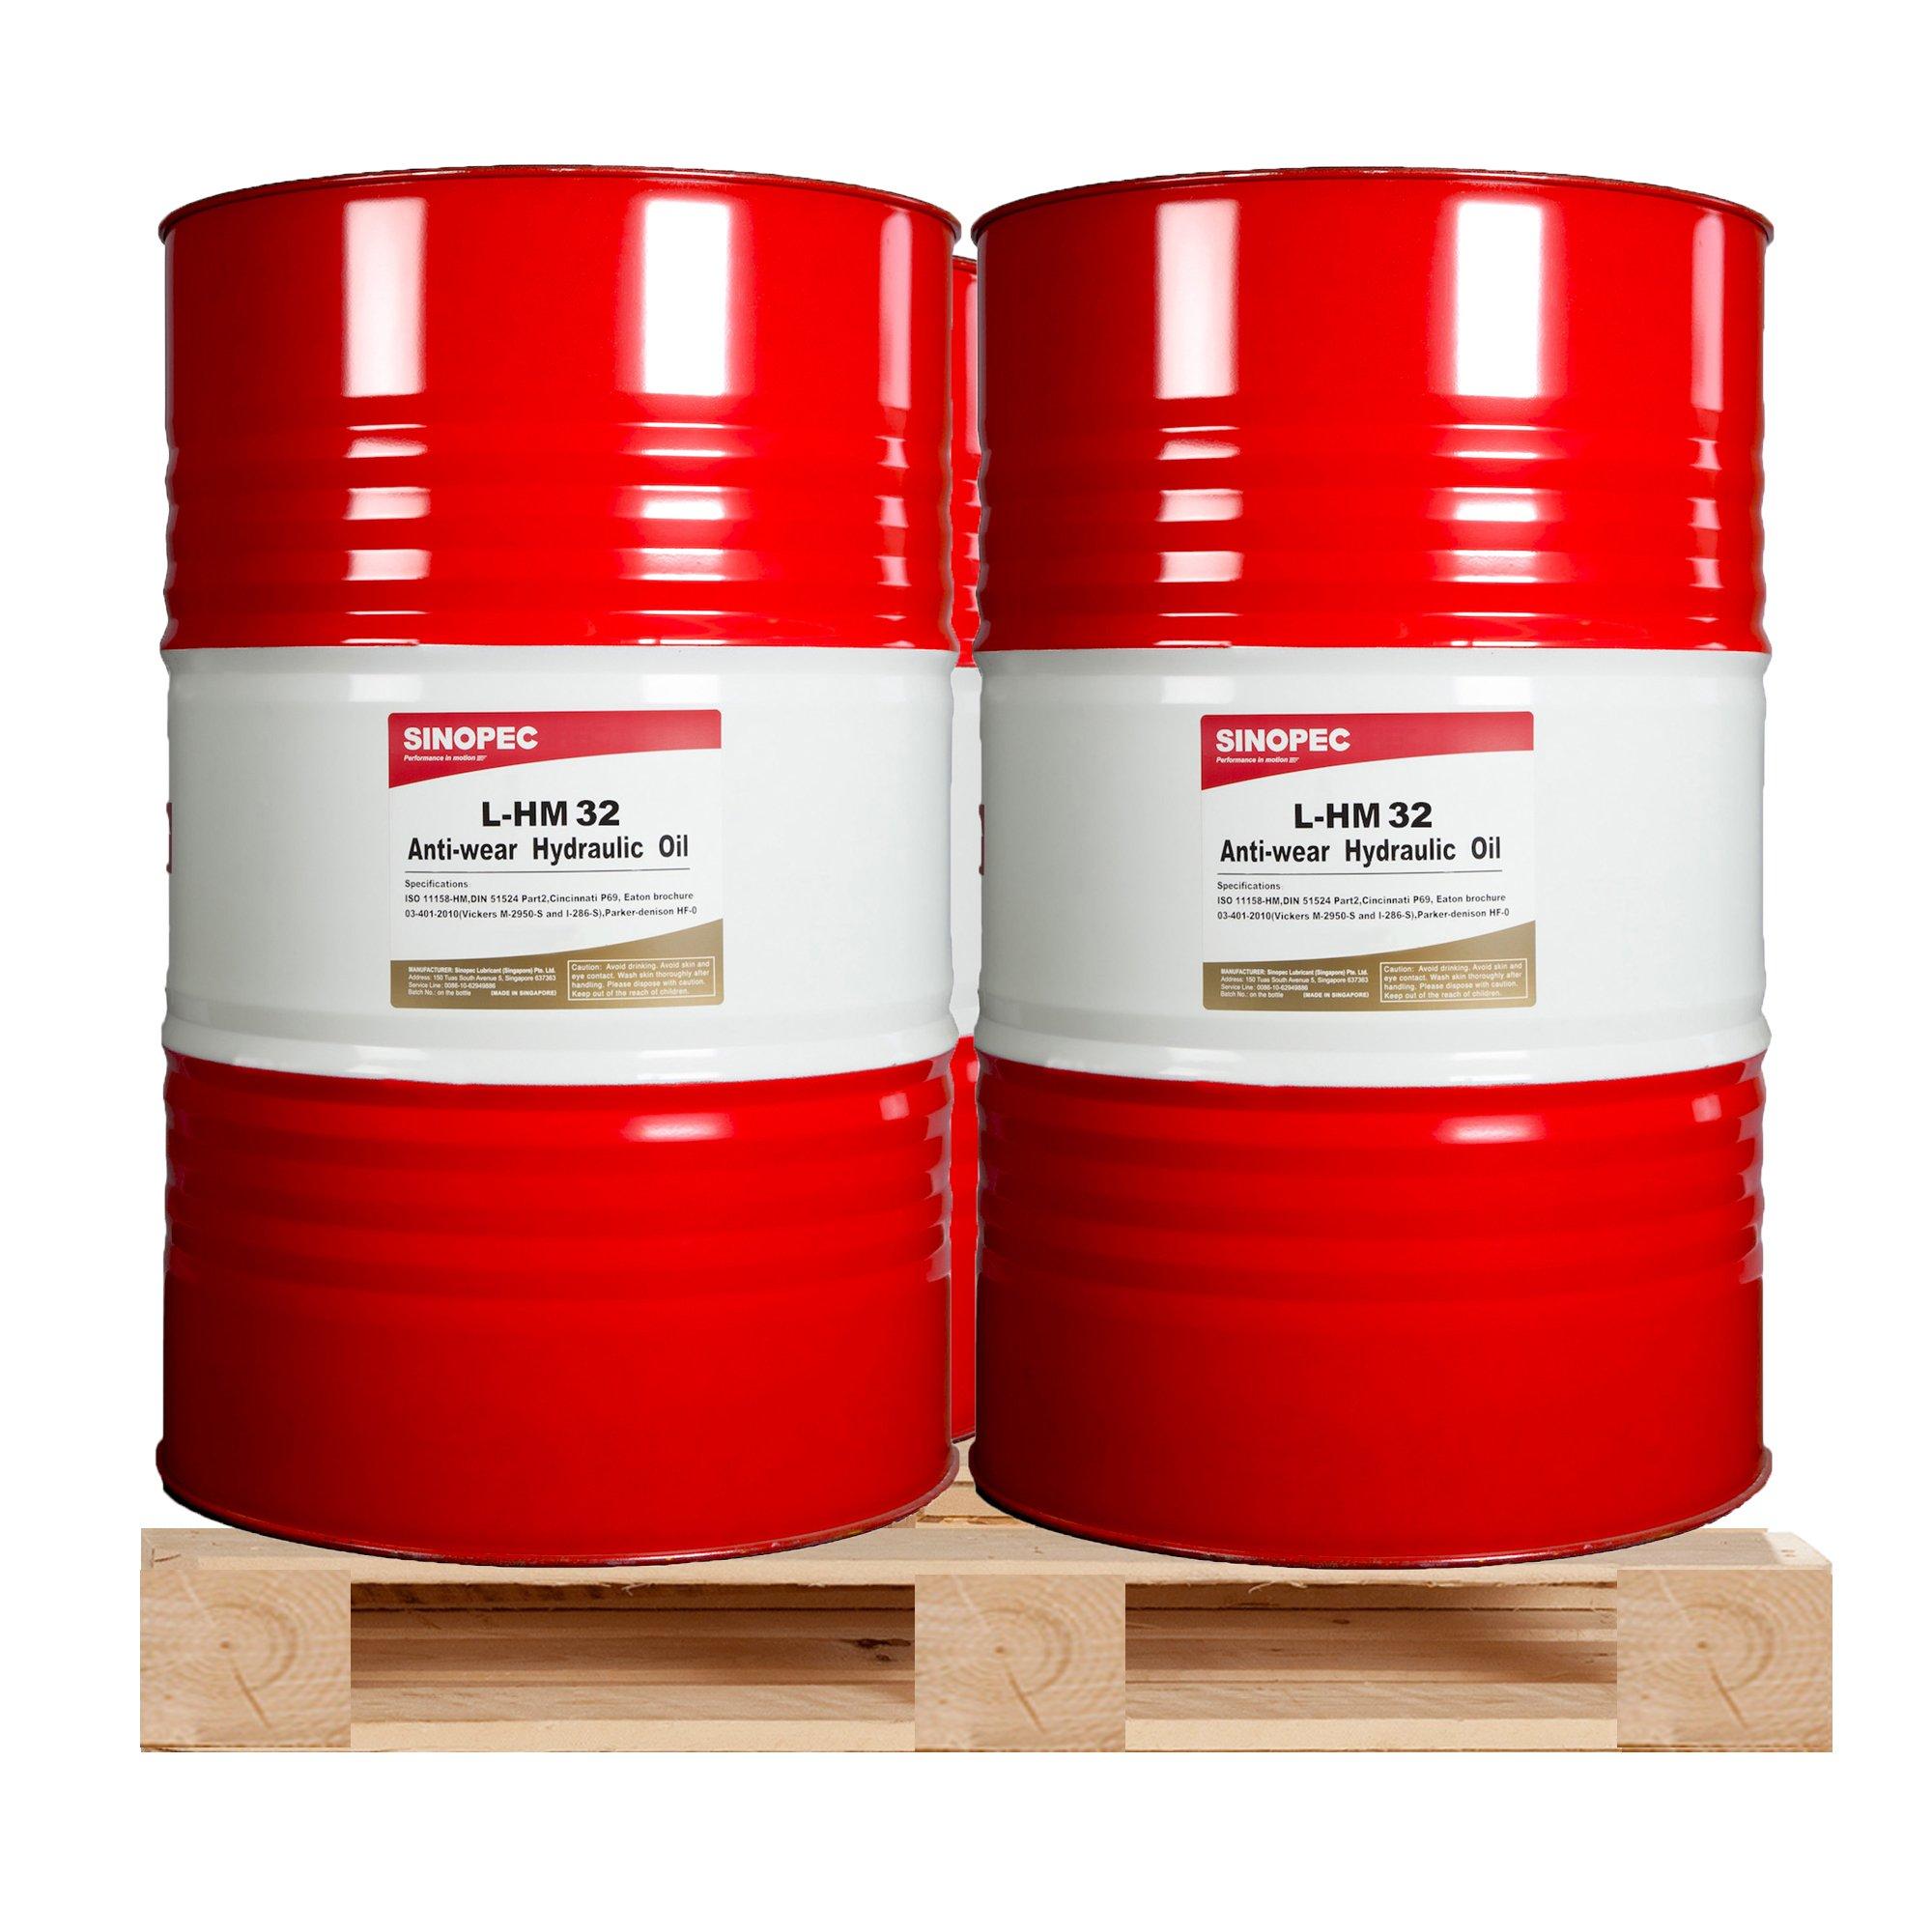 (4 Drum Bundle) AW 32 Hydraulic Oil Fluid (ISO VG 32, SAE 10W) - (4) 55 Gallon Drum by Sinopec